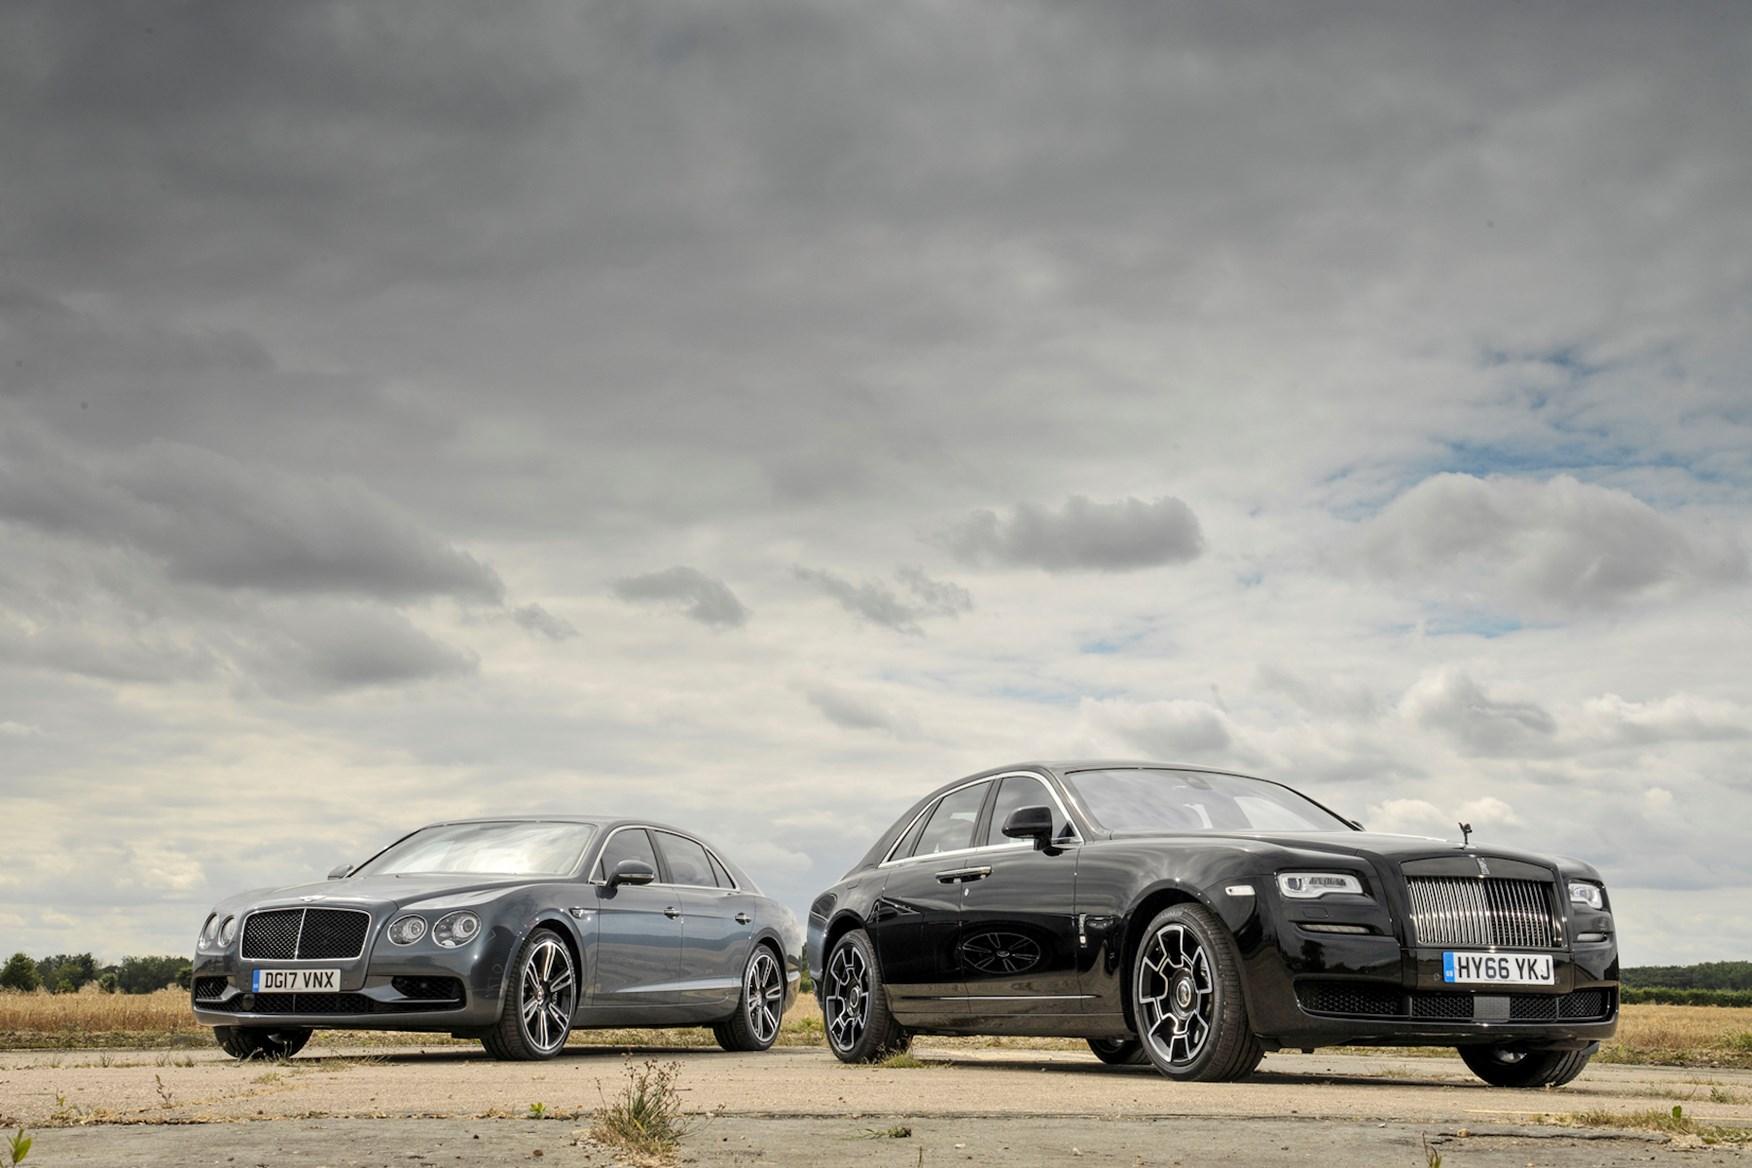 Twin Test: Bentley Flying Spur Vs Rolls-Royce Ghost